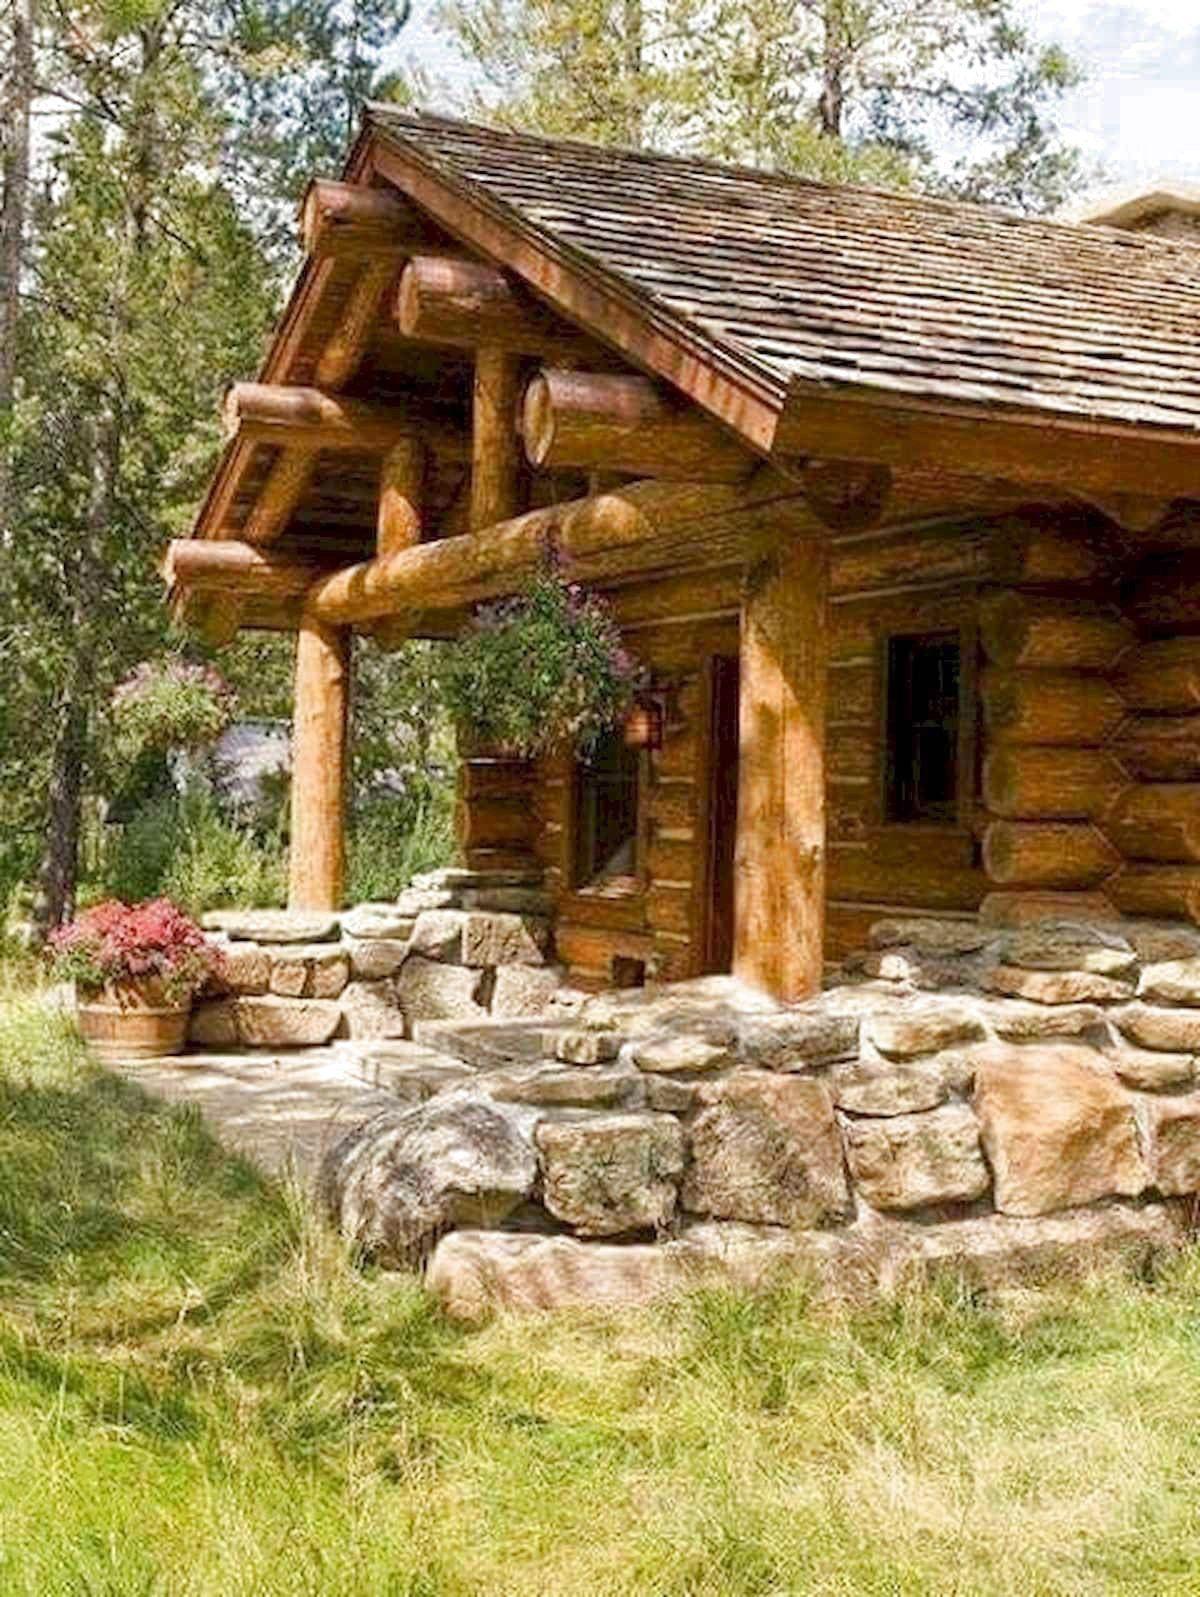 77 Favourite Log Cabin Homes Plans Design Ideas Log Cabin Homes Cabin Homes Log Homes